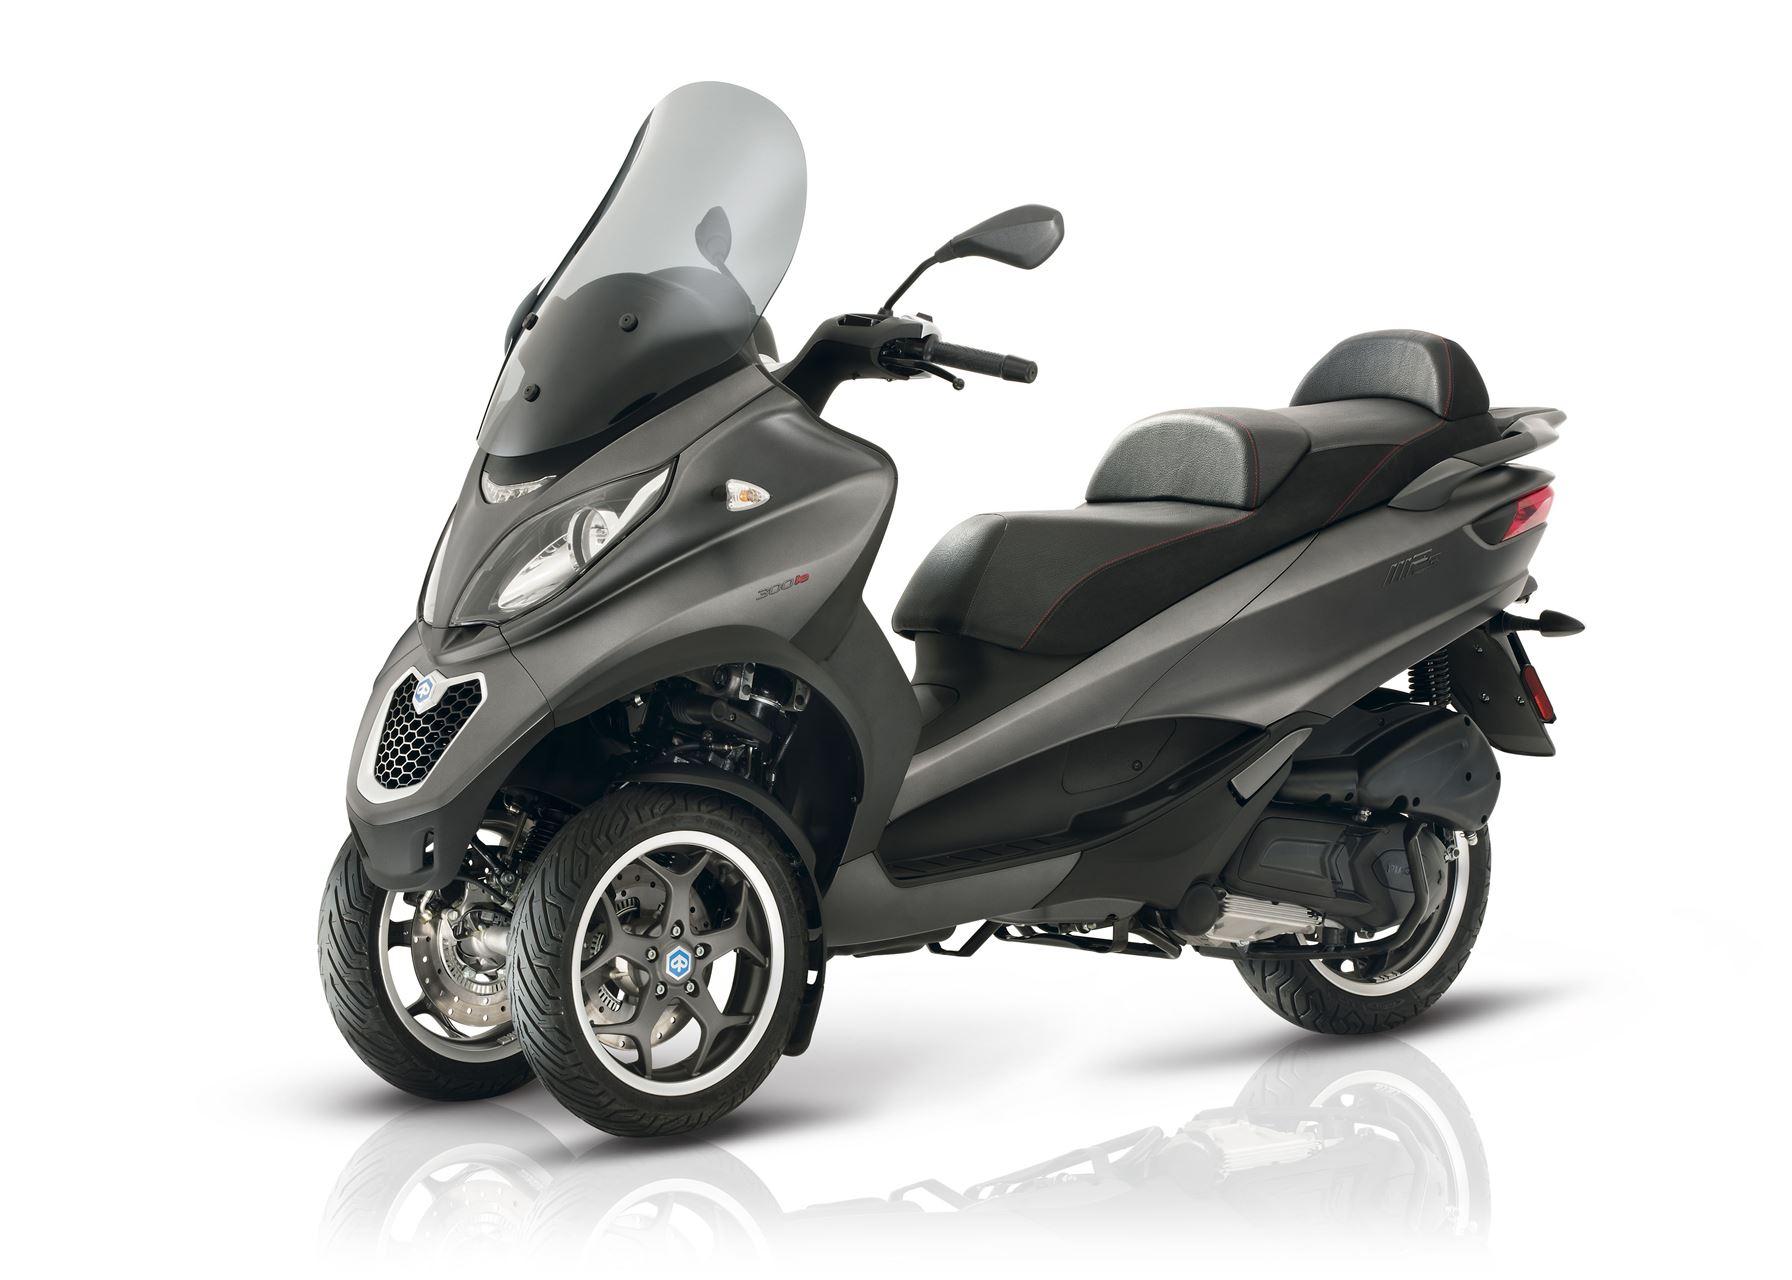 piaggio mp3 300 lt sport scooter acima 125 cc andar de moto. Black Bedroom Furniture Sets. Home Design Ideas